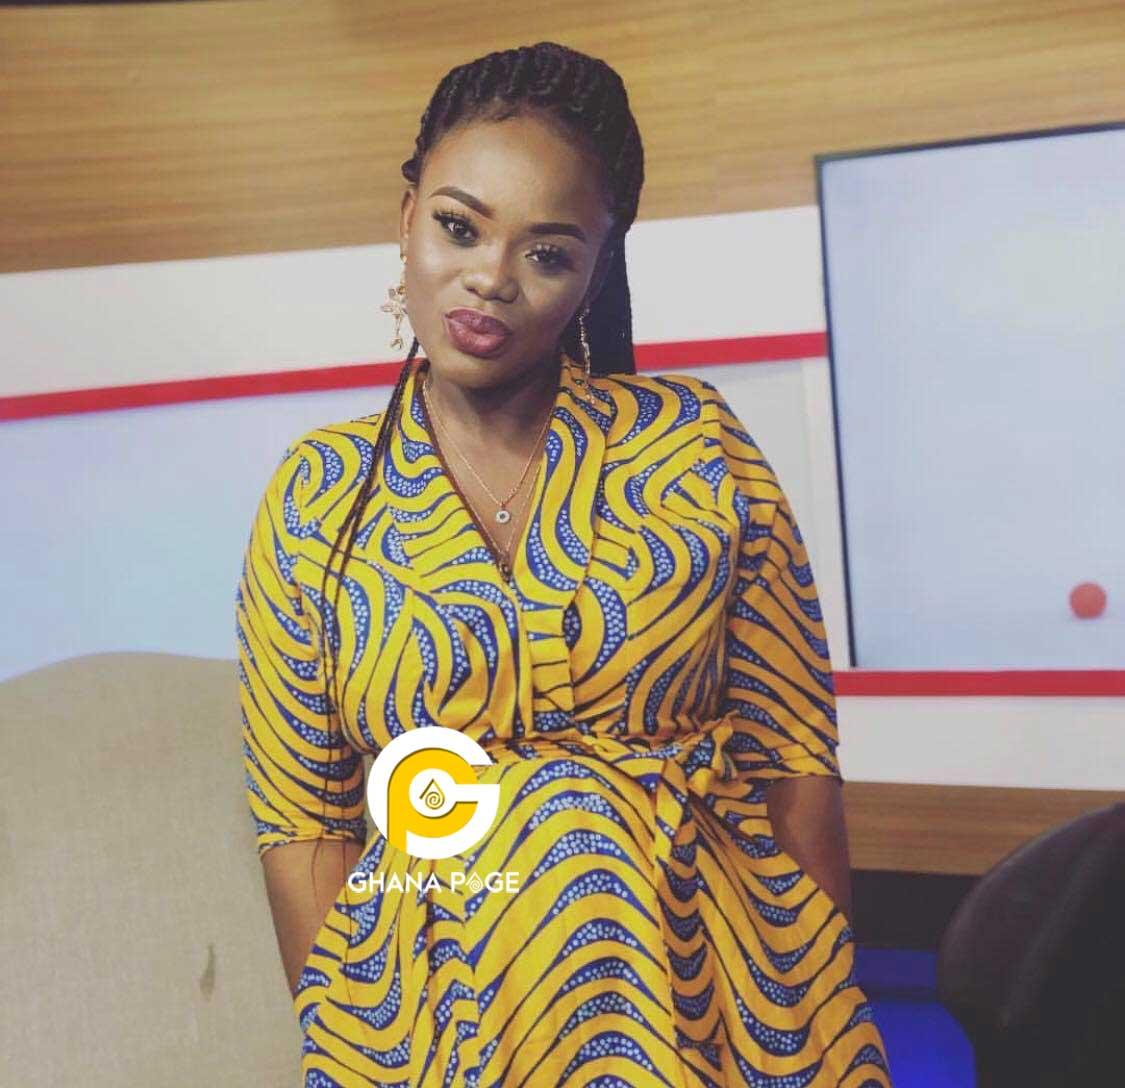 Akua Ghana most beautiful pregnant - 4th wife of Dr. Kwaku Oteng; Akua GMB pregnant with 3rd child